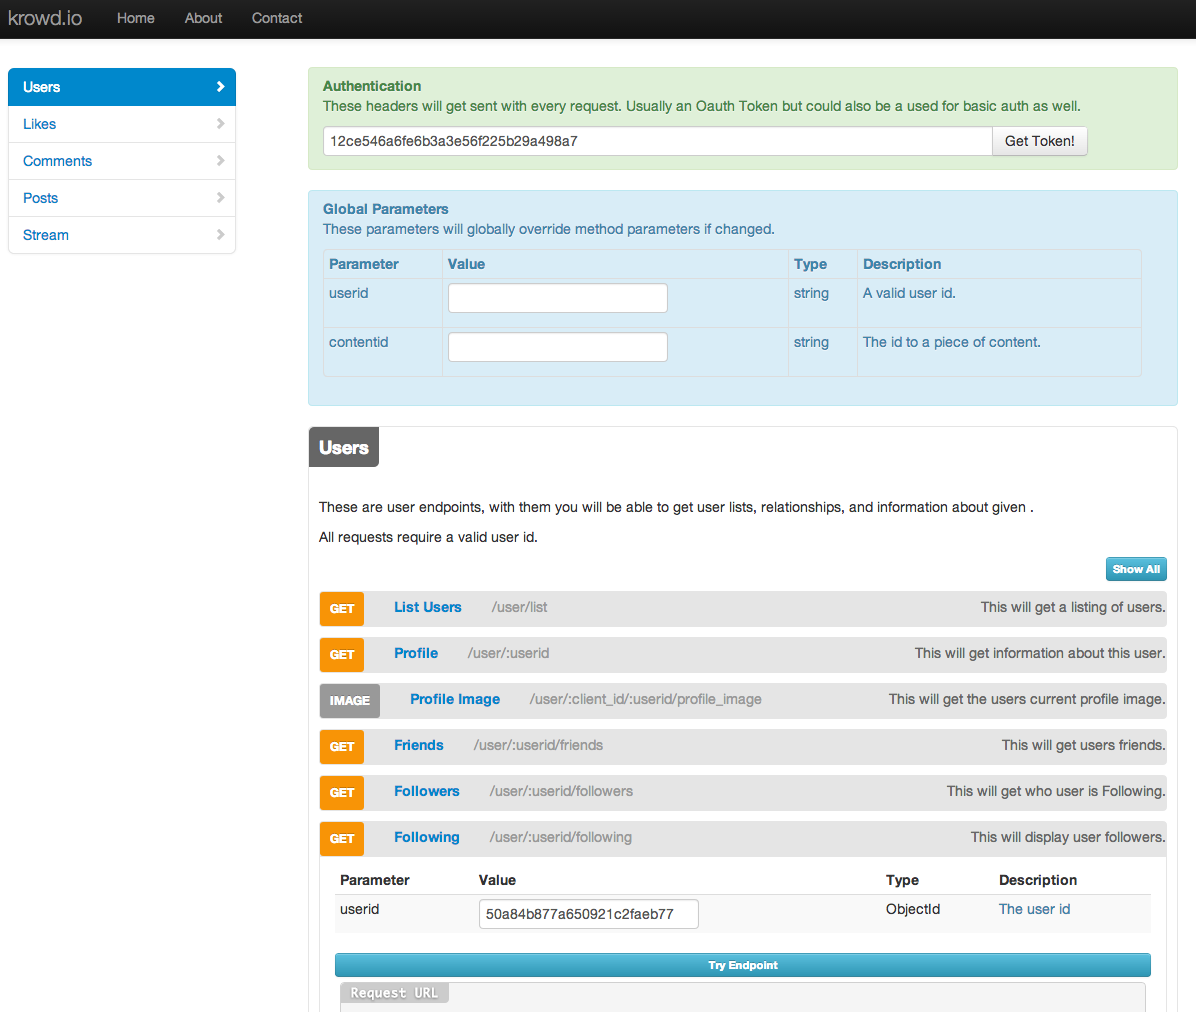 GitHub - krowdify/kaddy: A Bootstrap API explorer configured